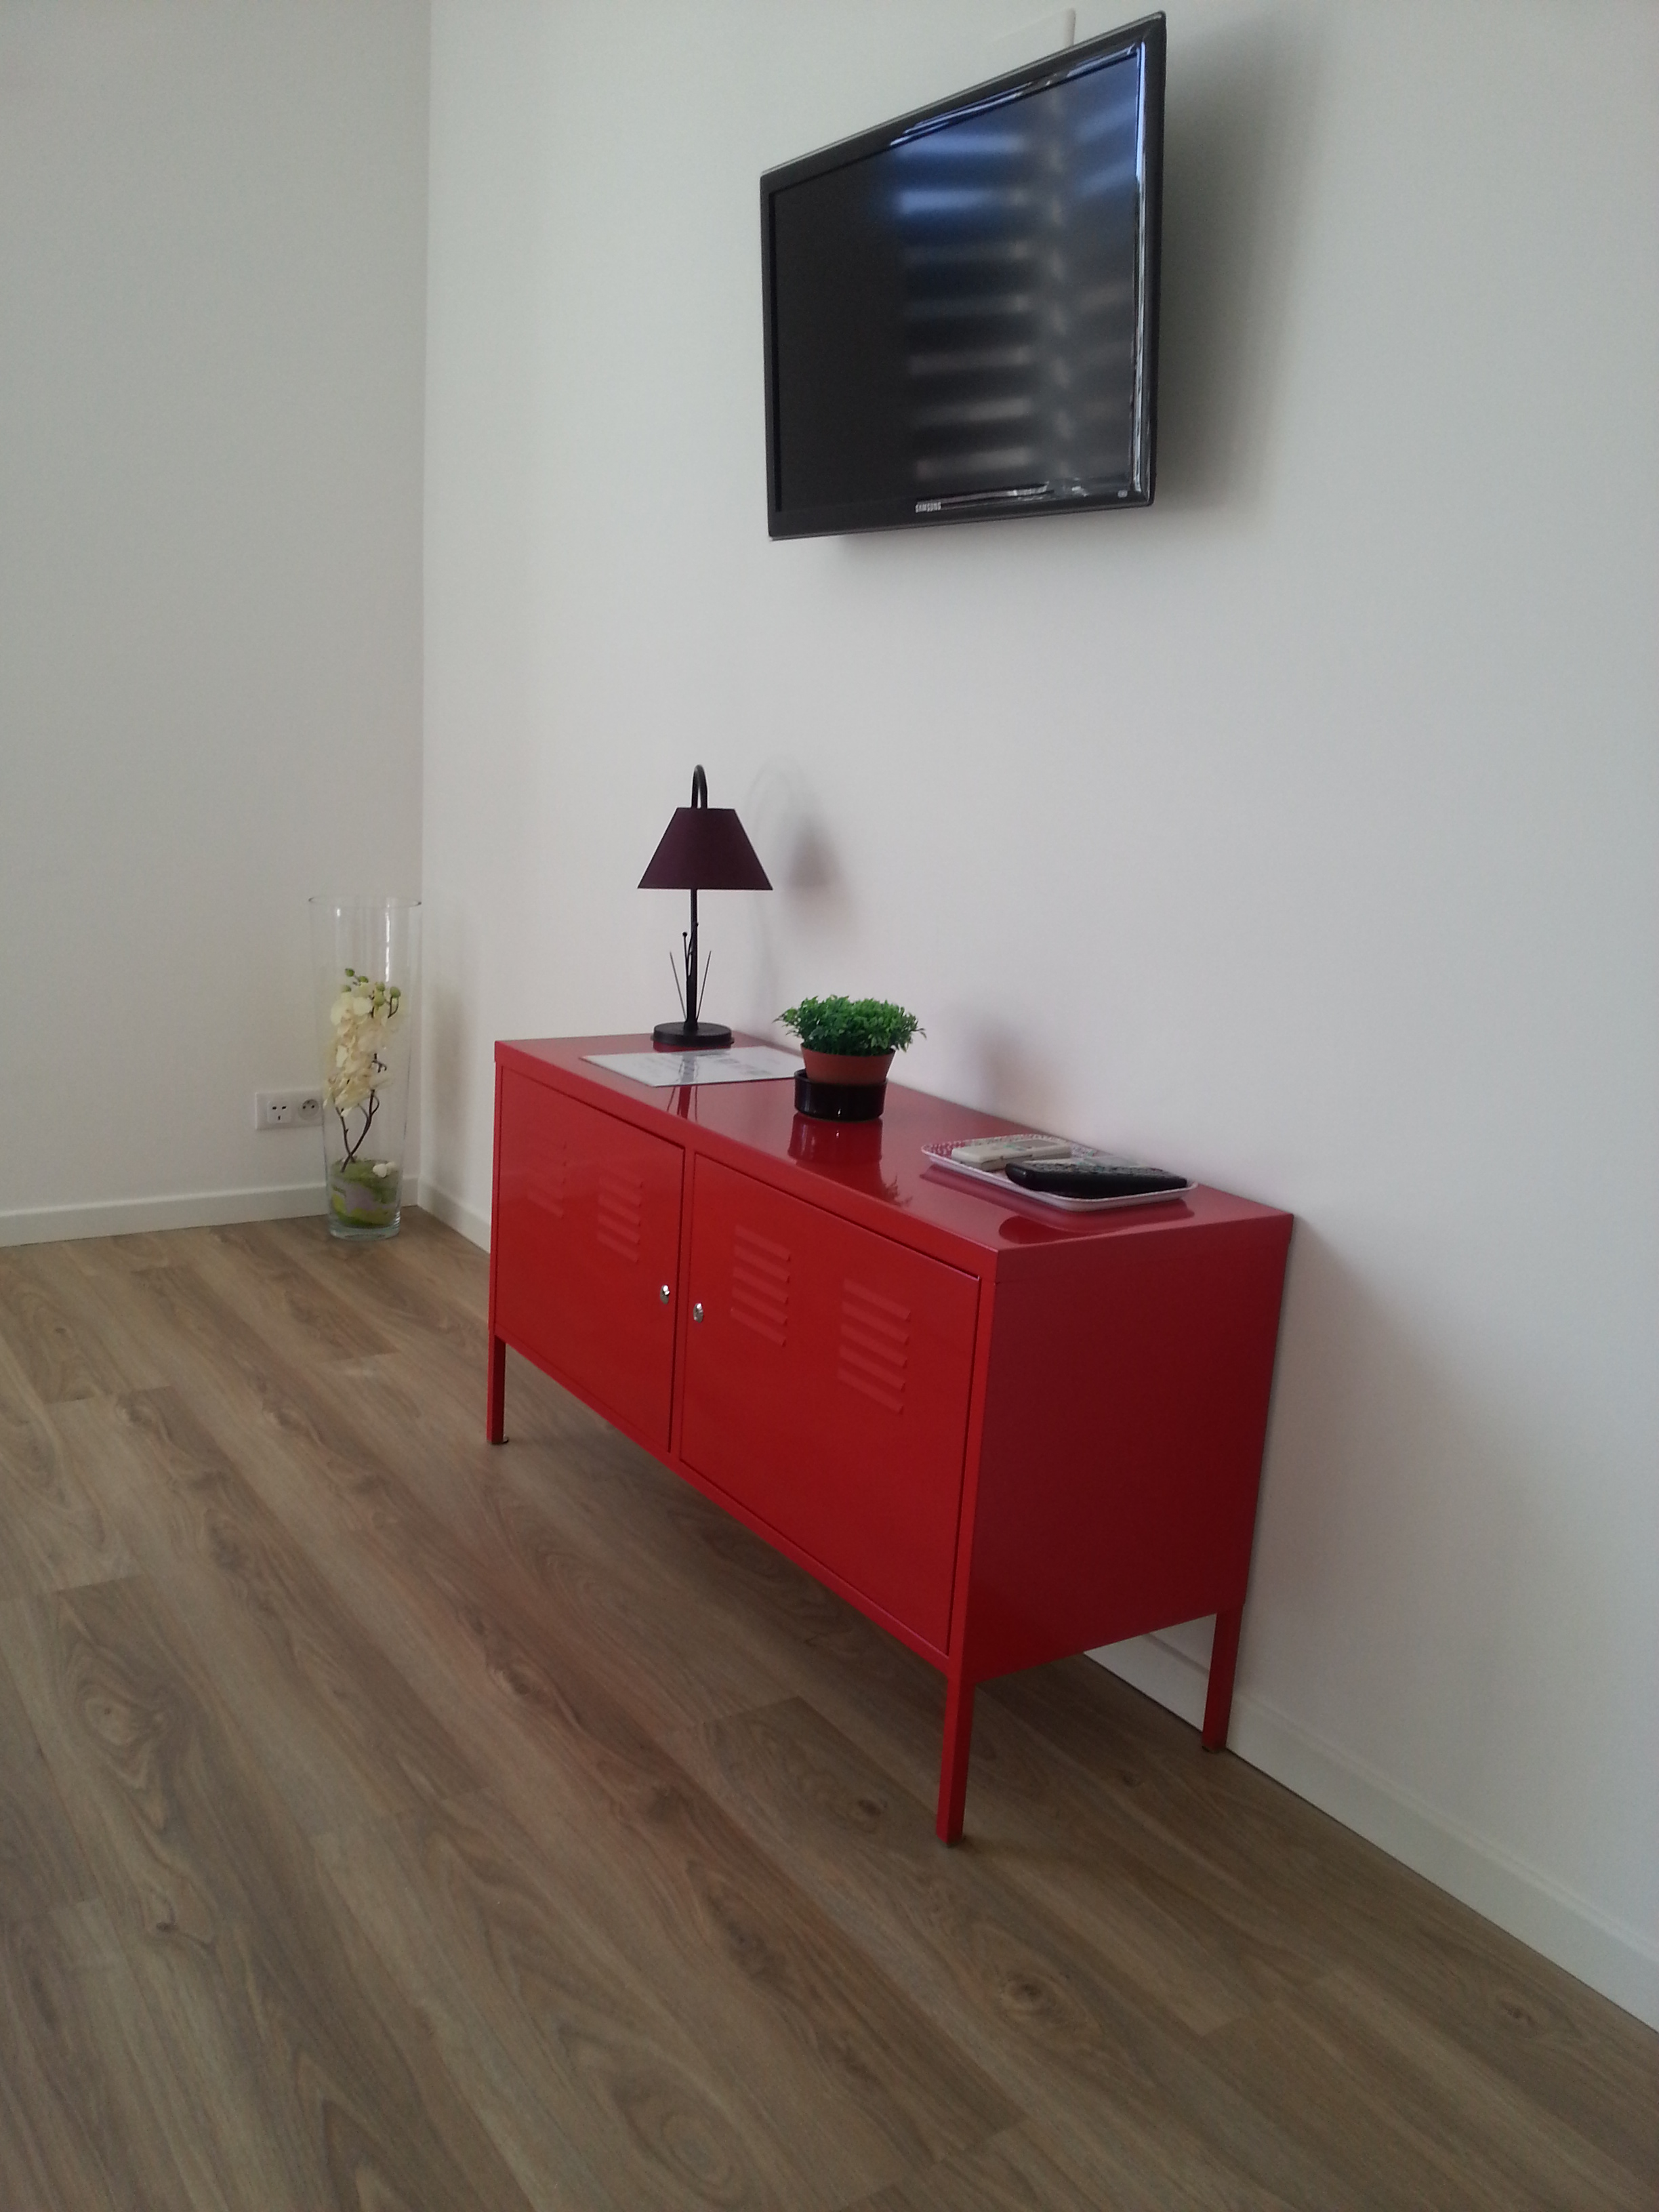 location tudiant location a partager entre tudiants meubl. Black Bedroom Furniture Sets. Home Design Ideas